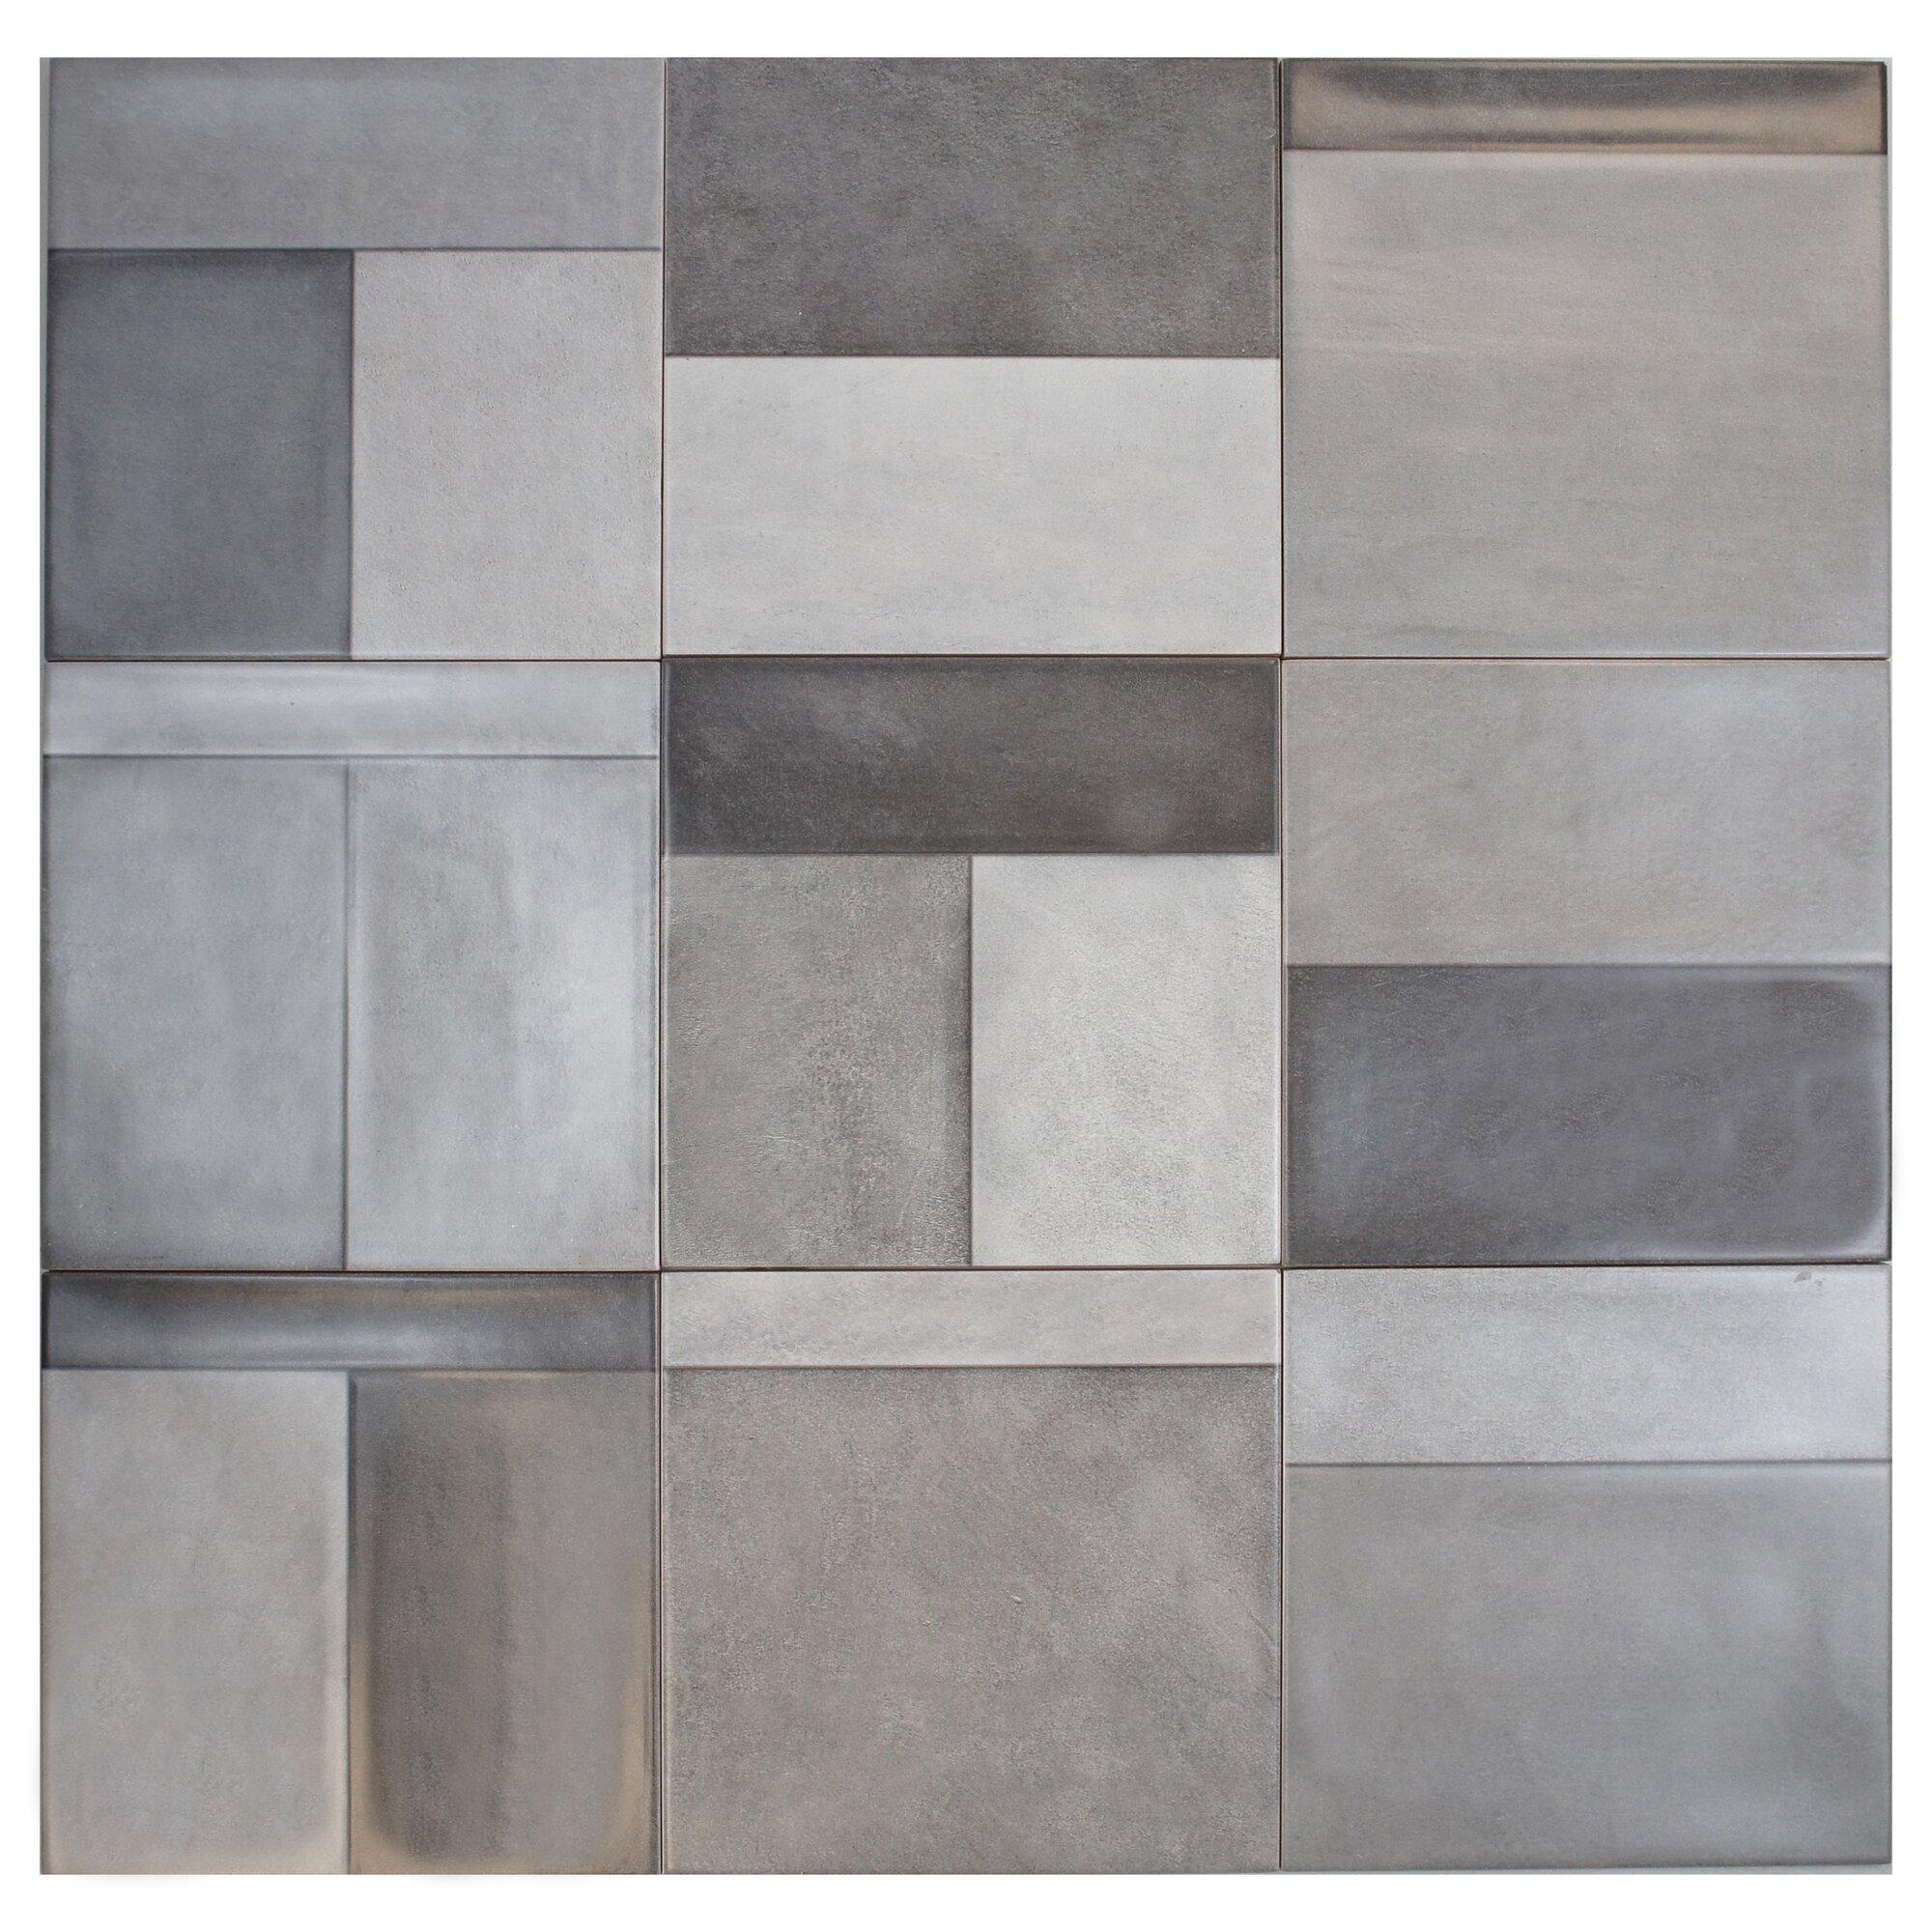 Tile Flooring 8 X 8 Ceramic Tile Flooring